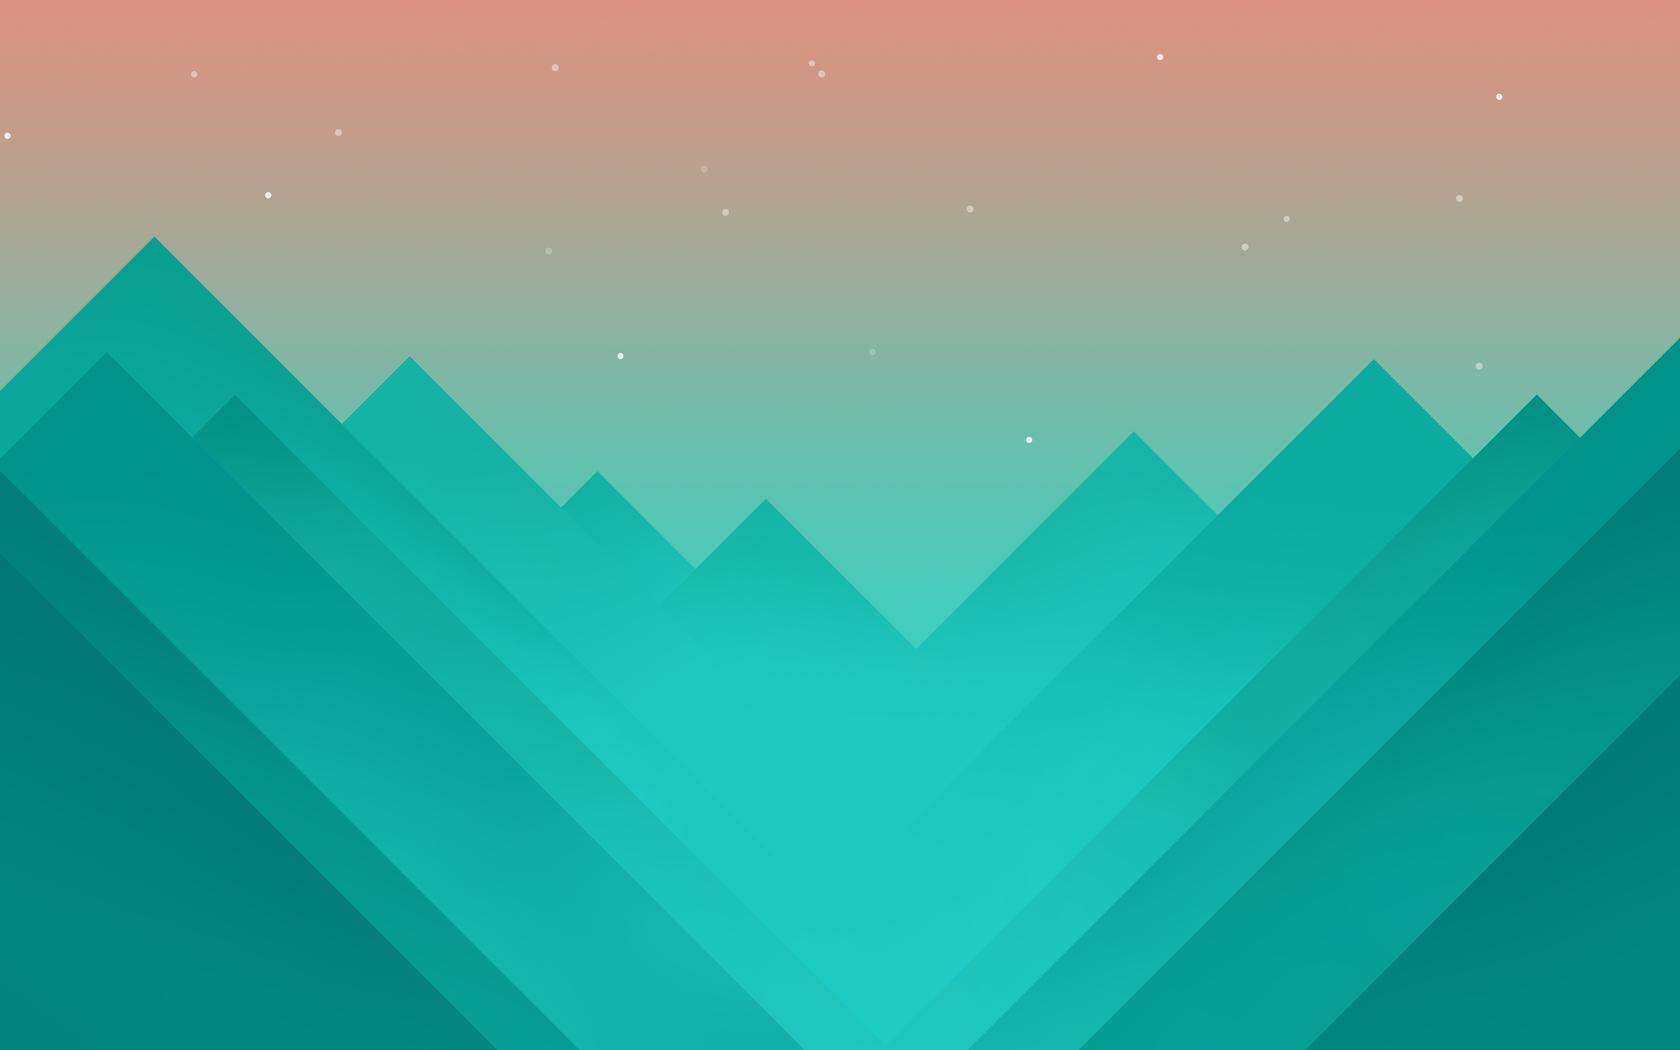 monument-valley-background-do.jpg